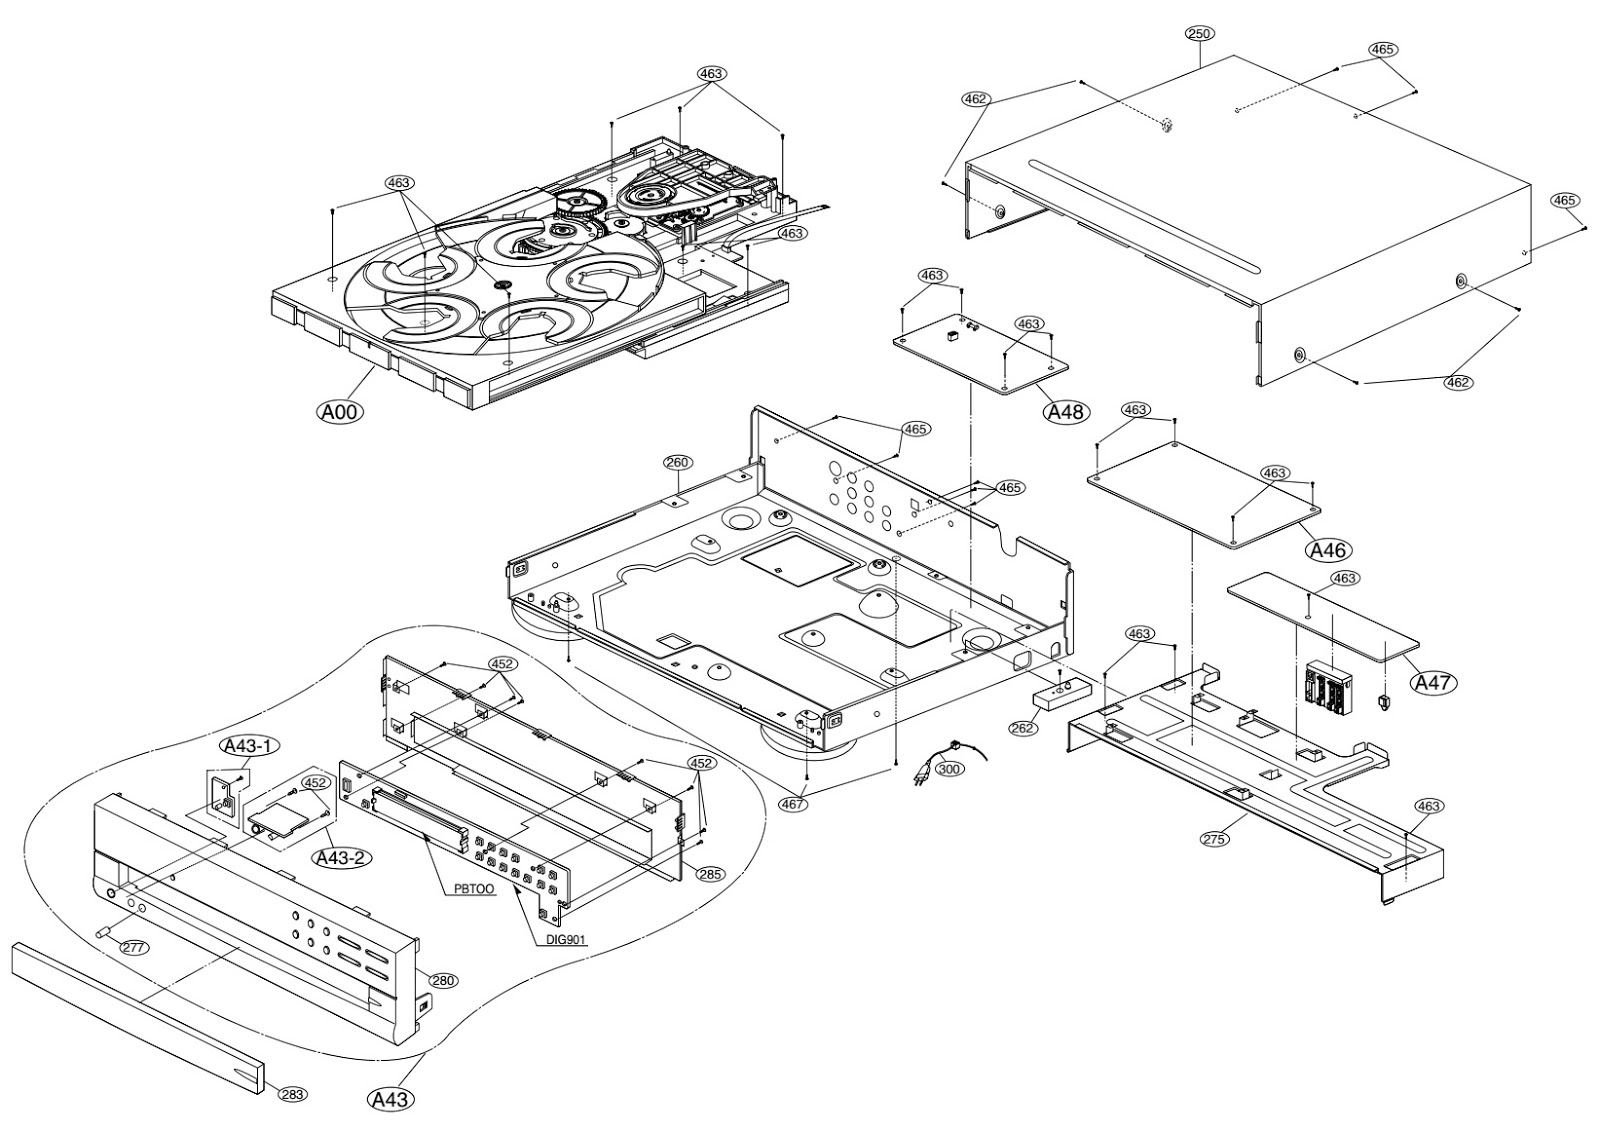 Harman Kardon Dvd 50 Circuit Diagram Disassembly